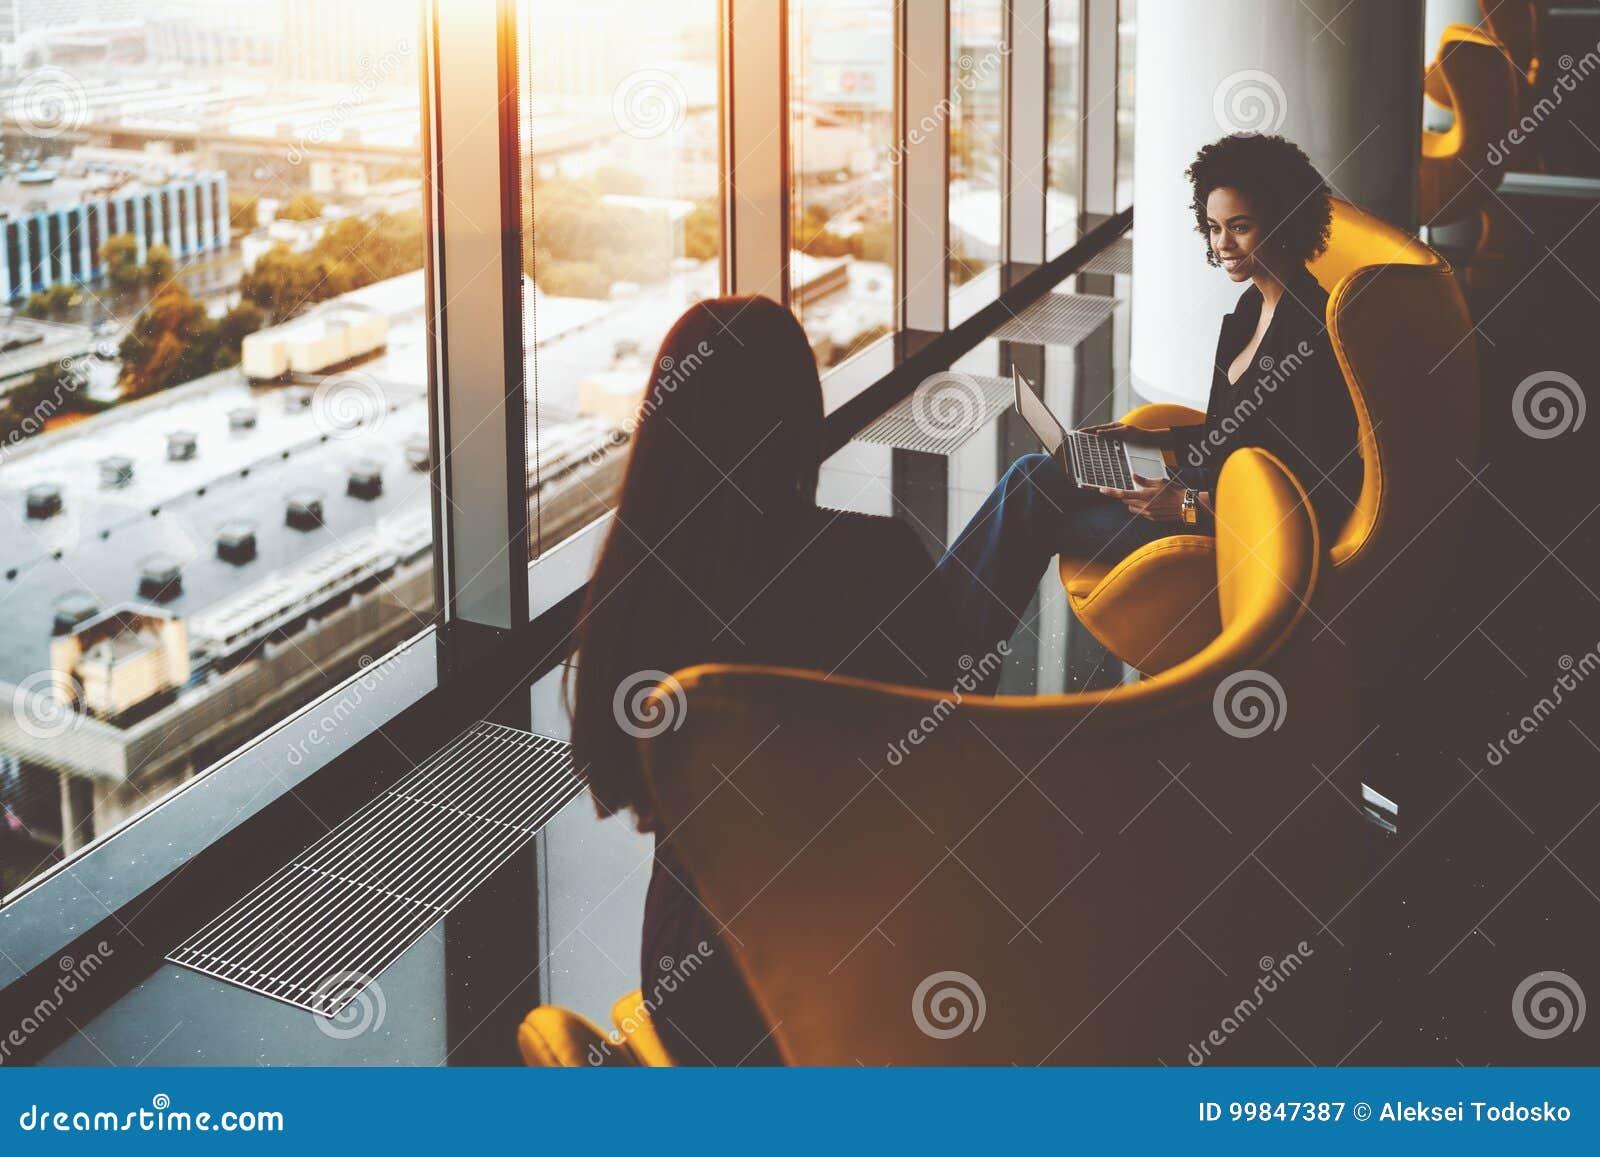 Two businesswomen having work meeting near office windows